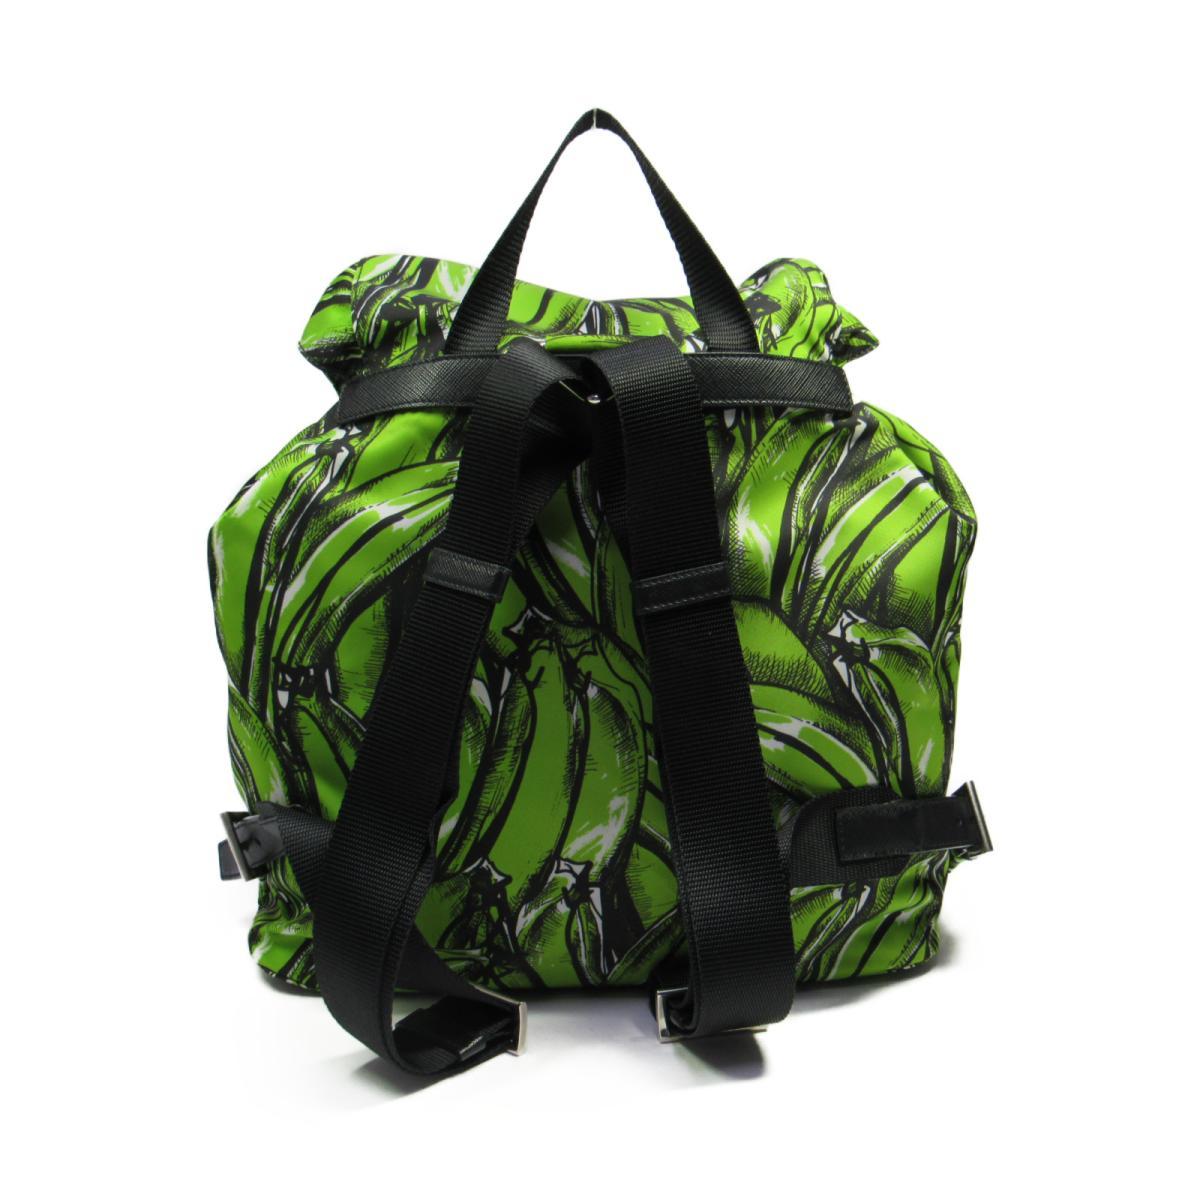 7601e3e1f9816b Prada rucksack bag men gap Dis men nylon green x black | PRADA BRANDOFF  brand off-brand brand bag back backpack rucksack school